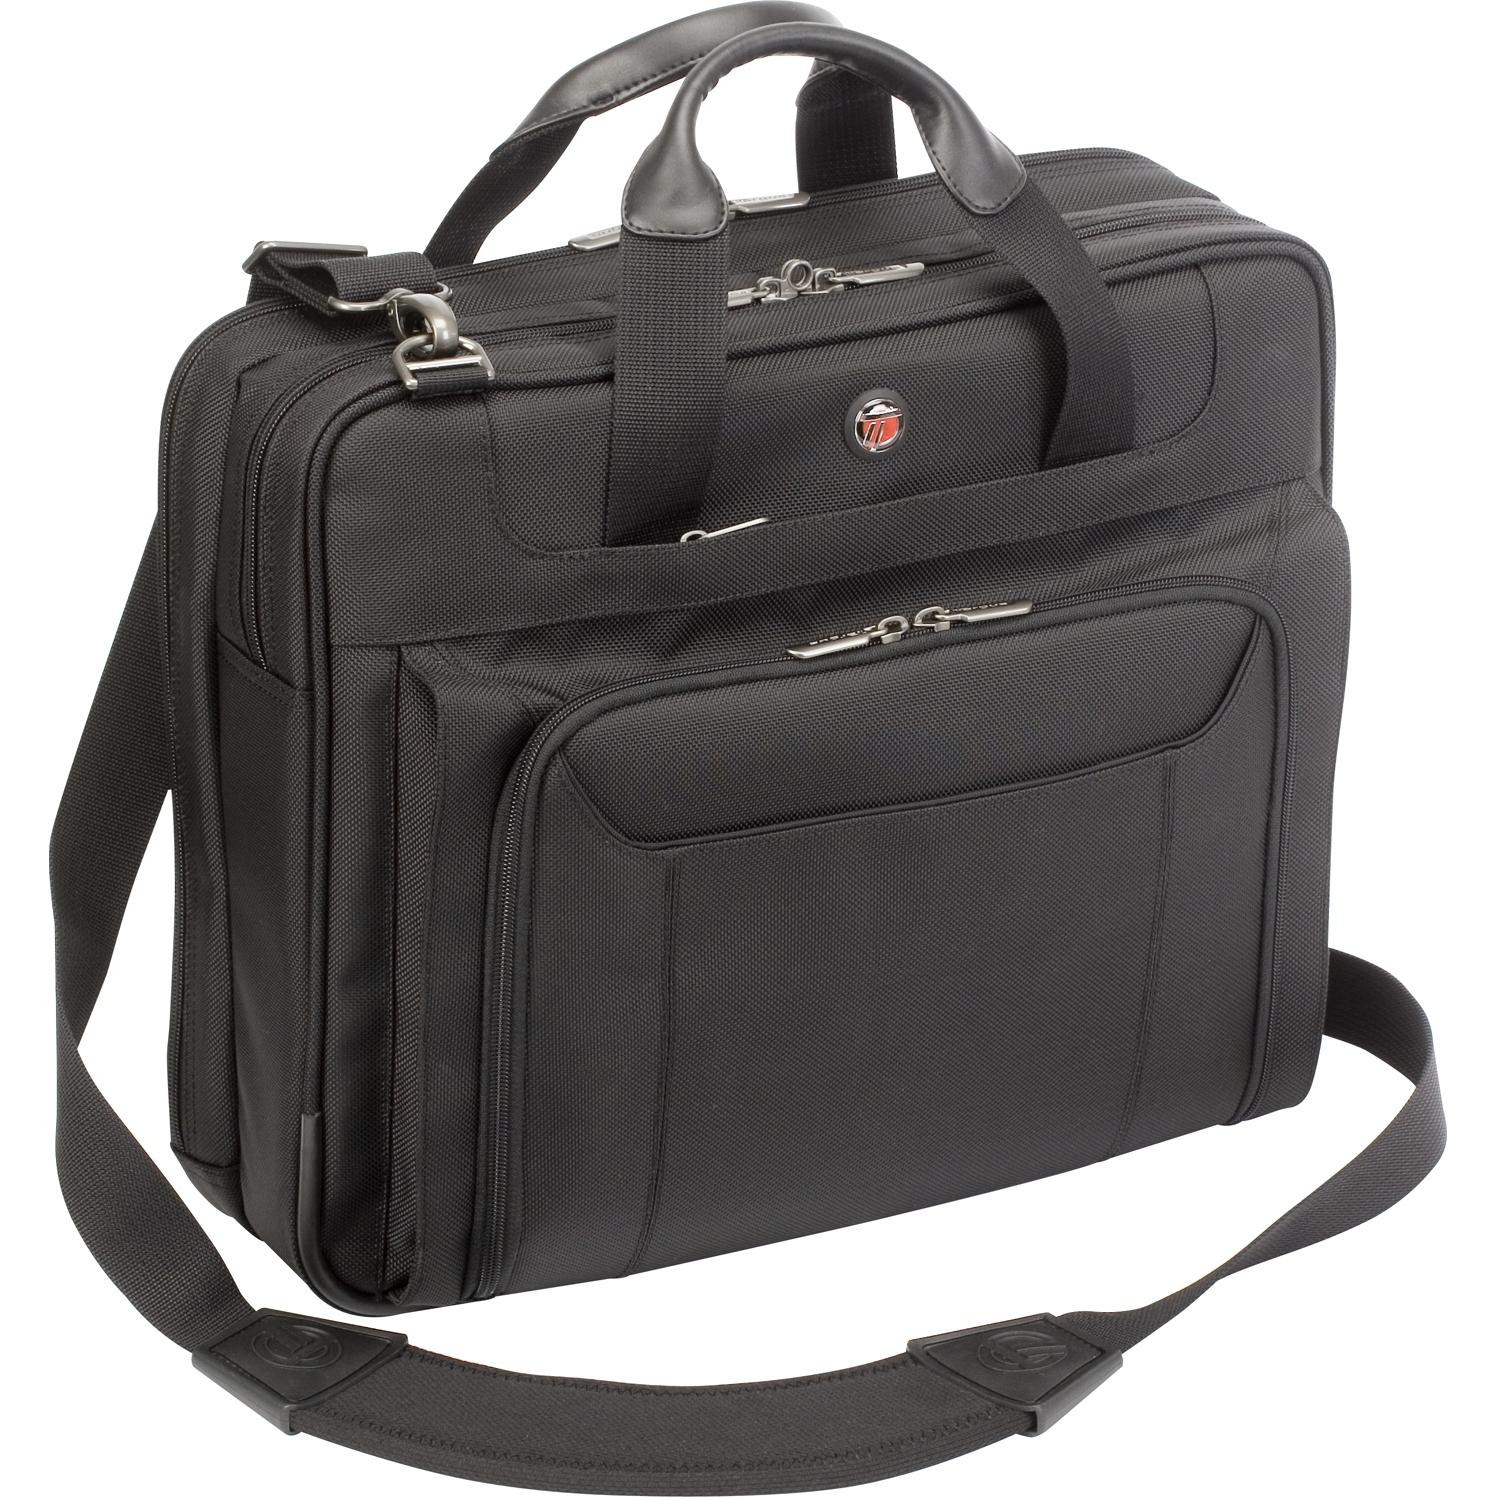 Zip-Thru Corporate Traveler Laptop Case - Notebook carrying case - 14 inch - black